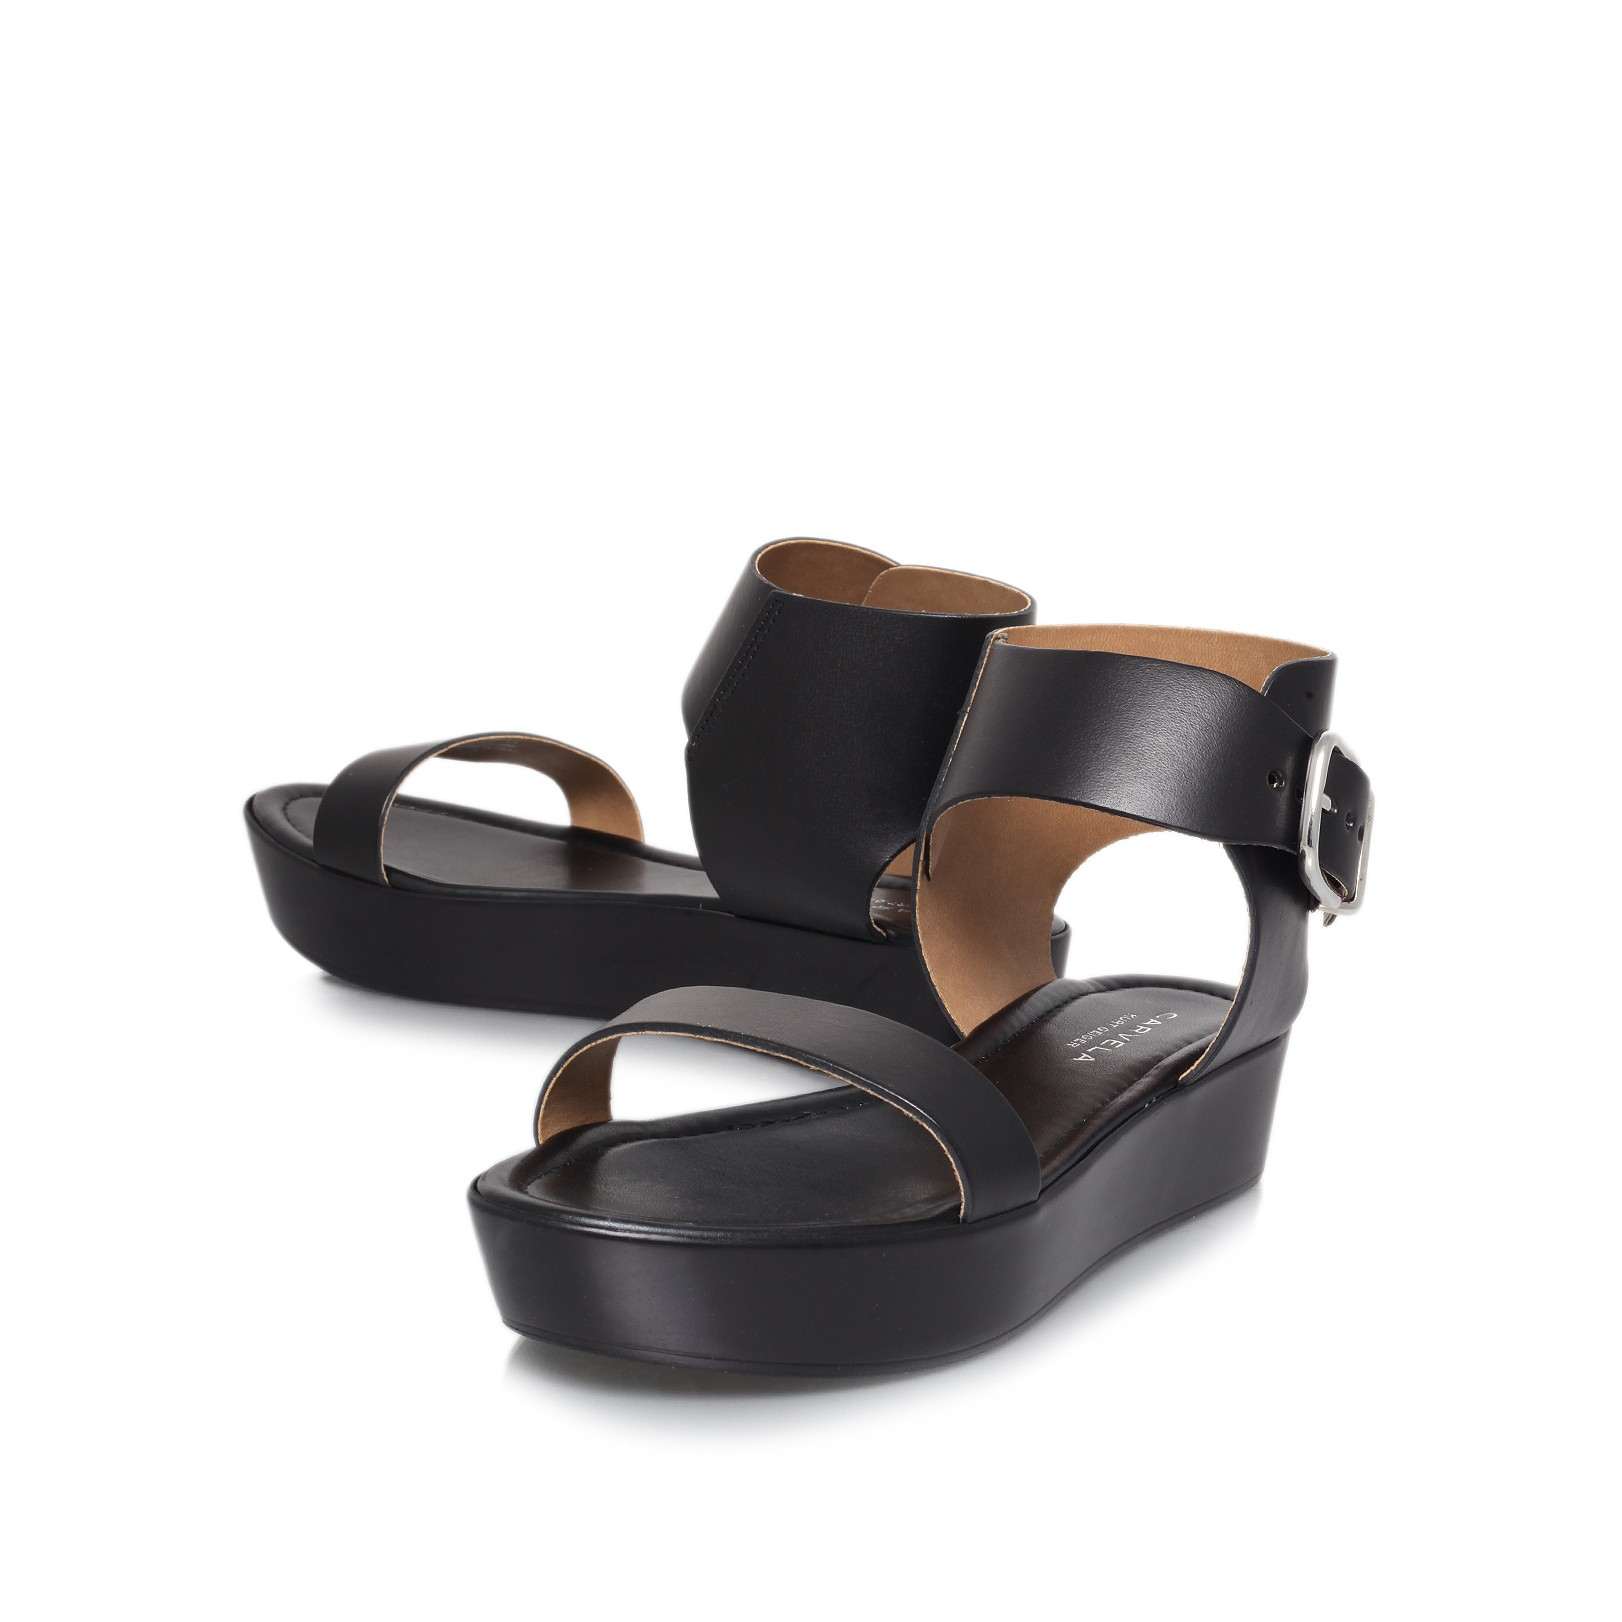 kurt geiger footwear 2 Kurt geiger sa  @kurtgeigersa mar 2 more copy link to tweet embed tweet get set for a new season and lay-by the perfect footwear styles at #kurtgeigersa.